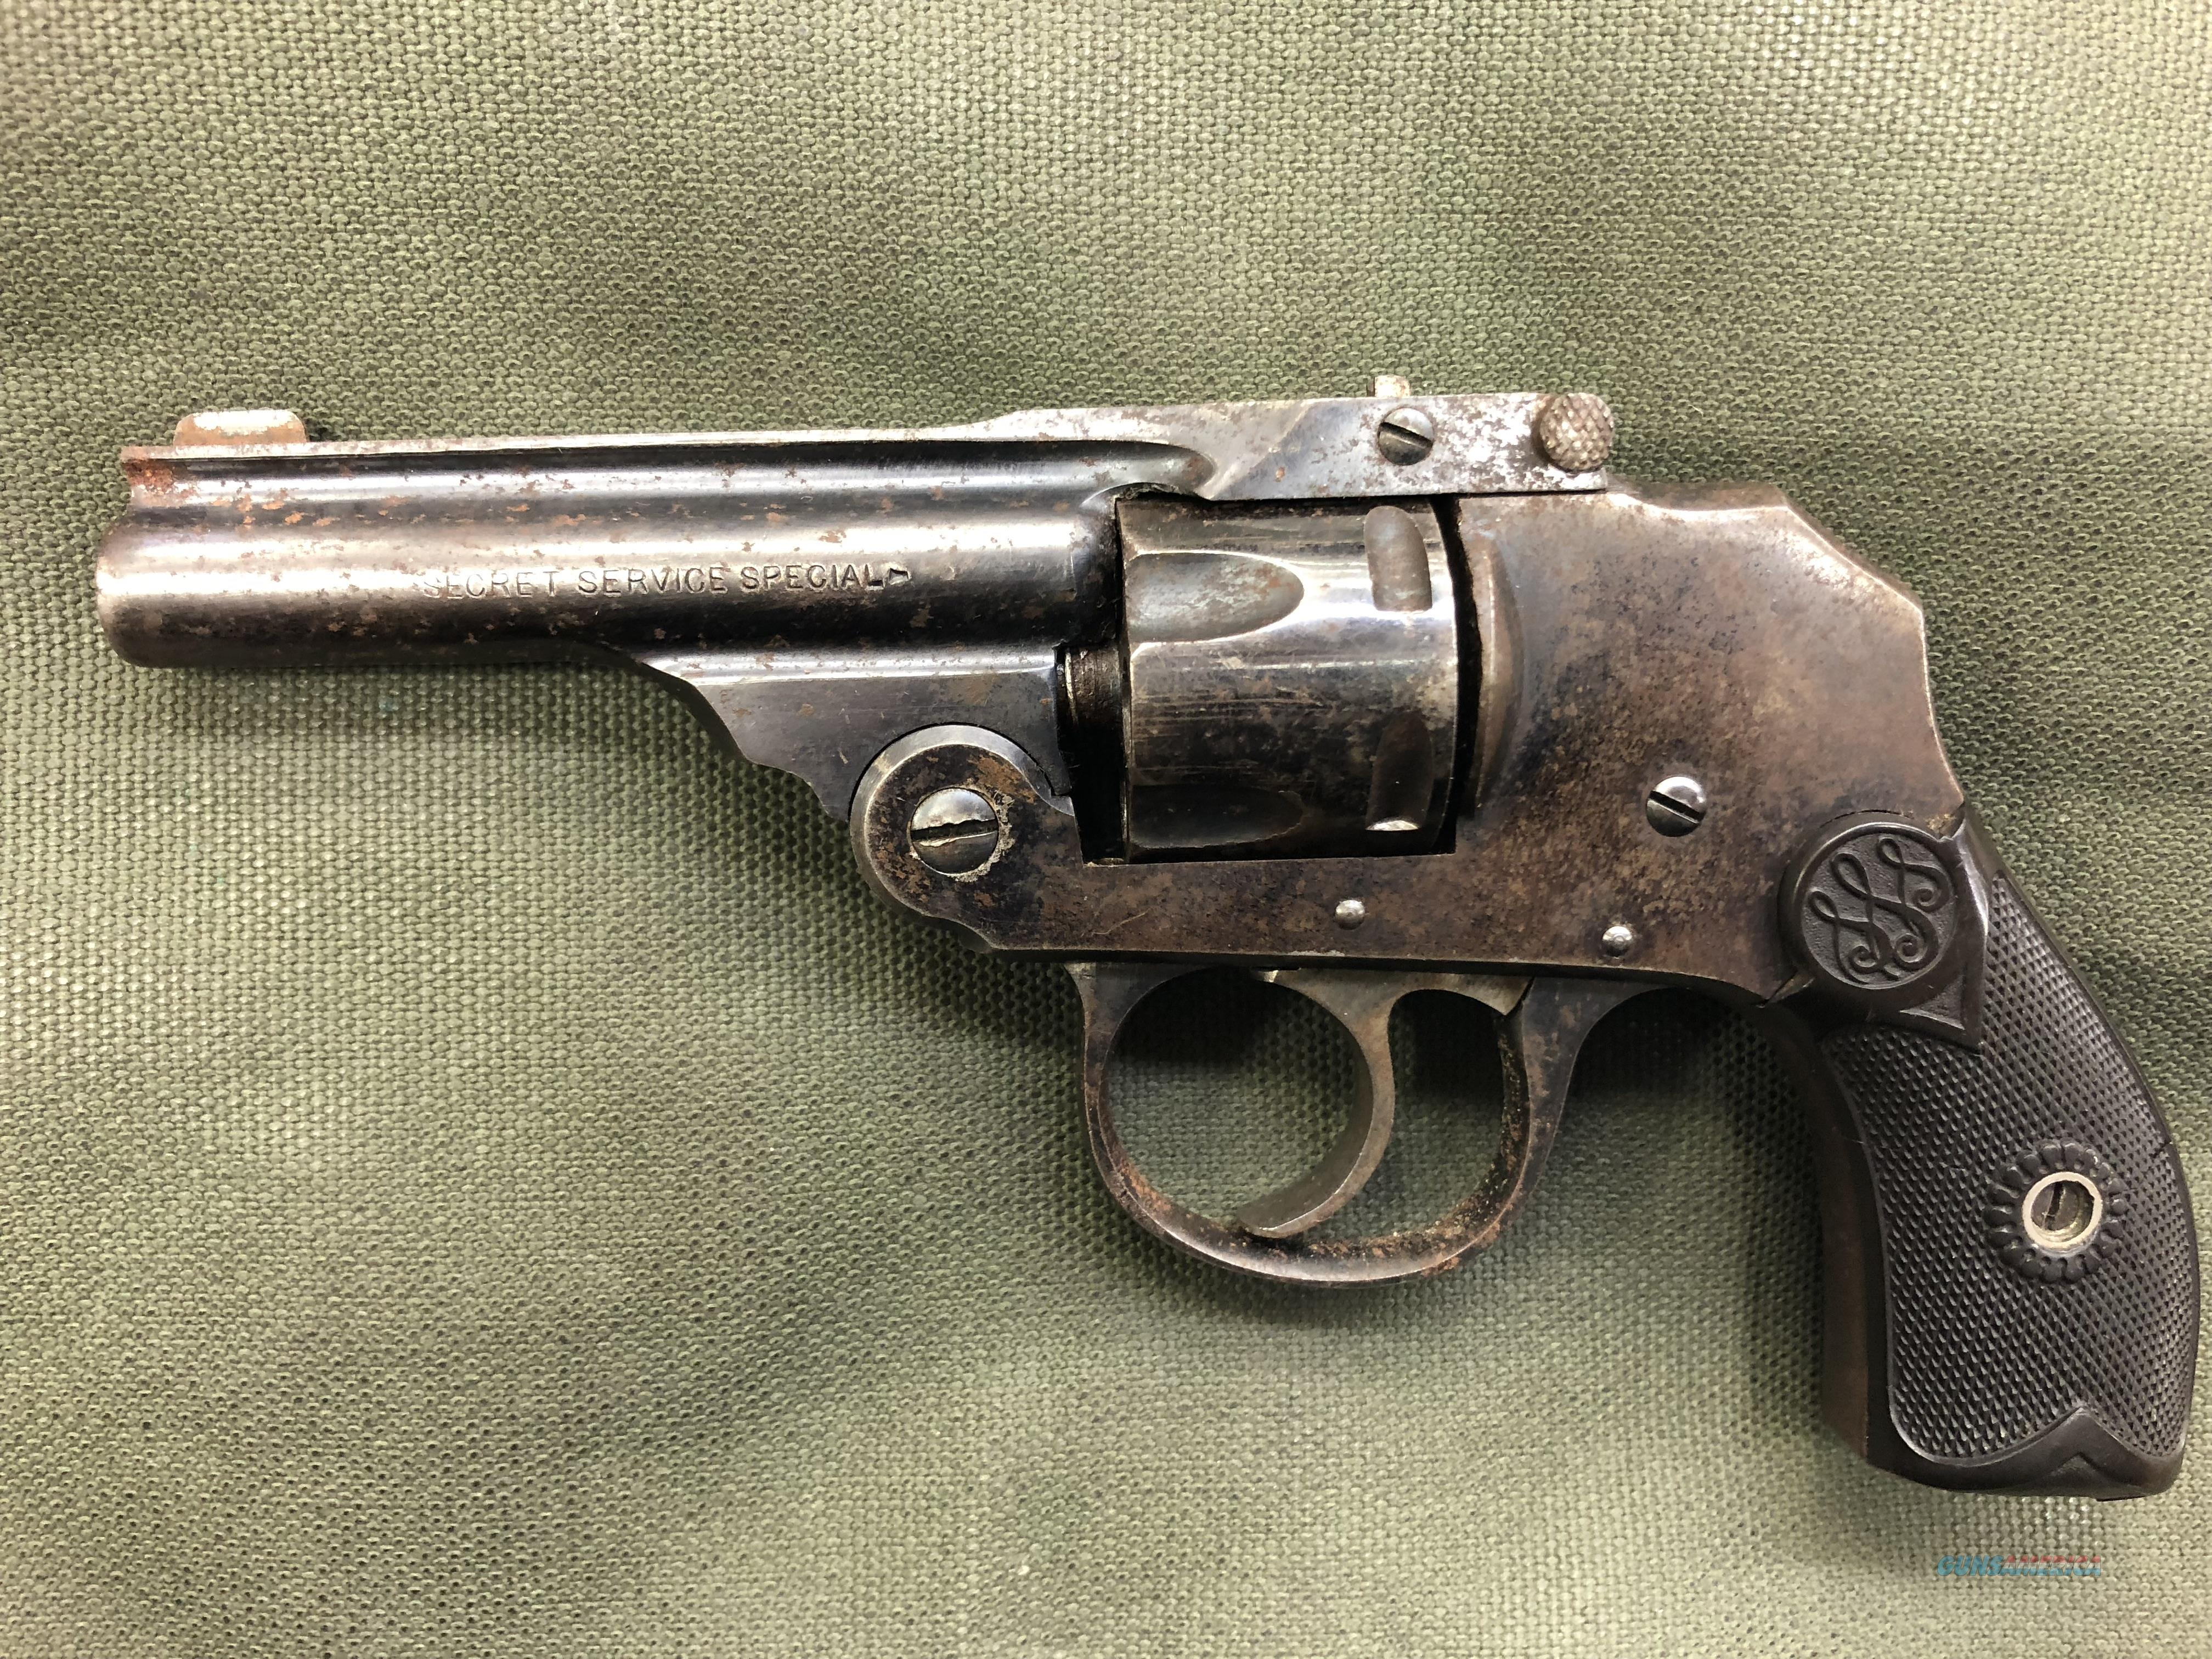 Smith & Wesson Secret Servie Special 32 cal.  Guns > Pistols > Smith & Wesson Revolvers > Small Frame ( J )